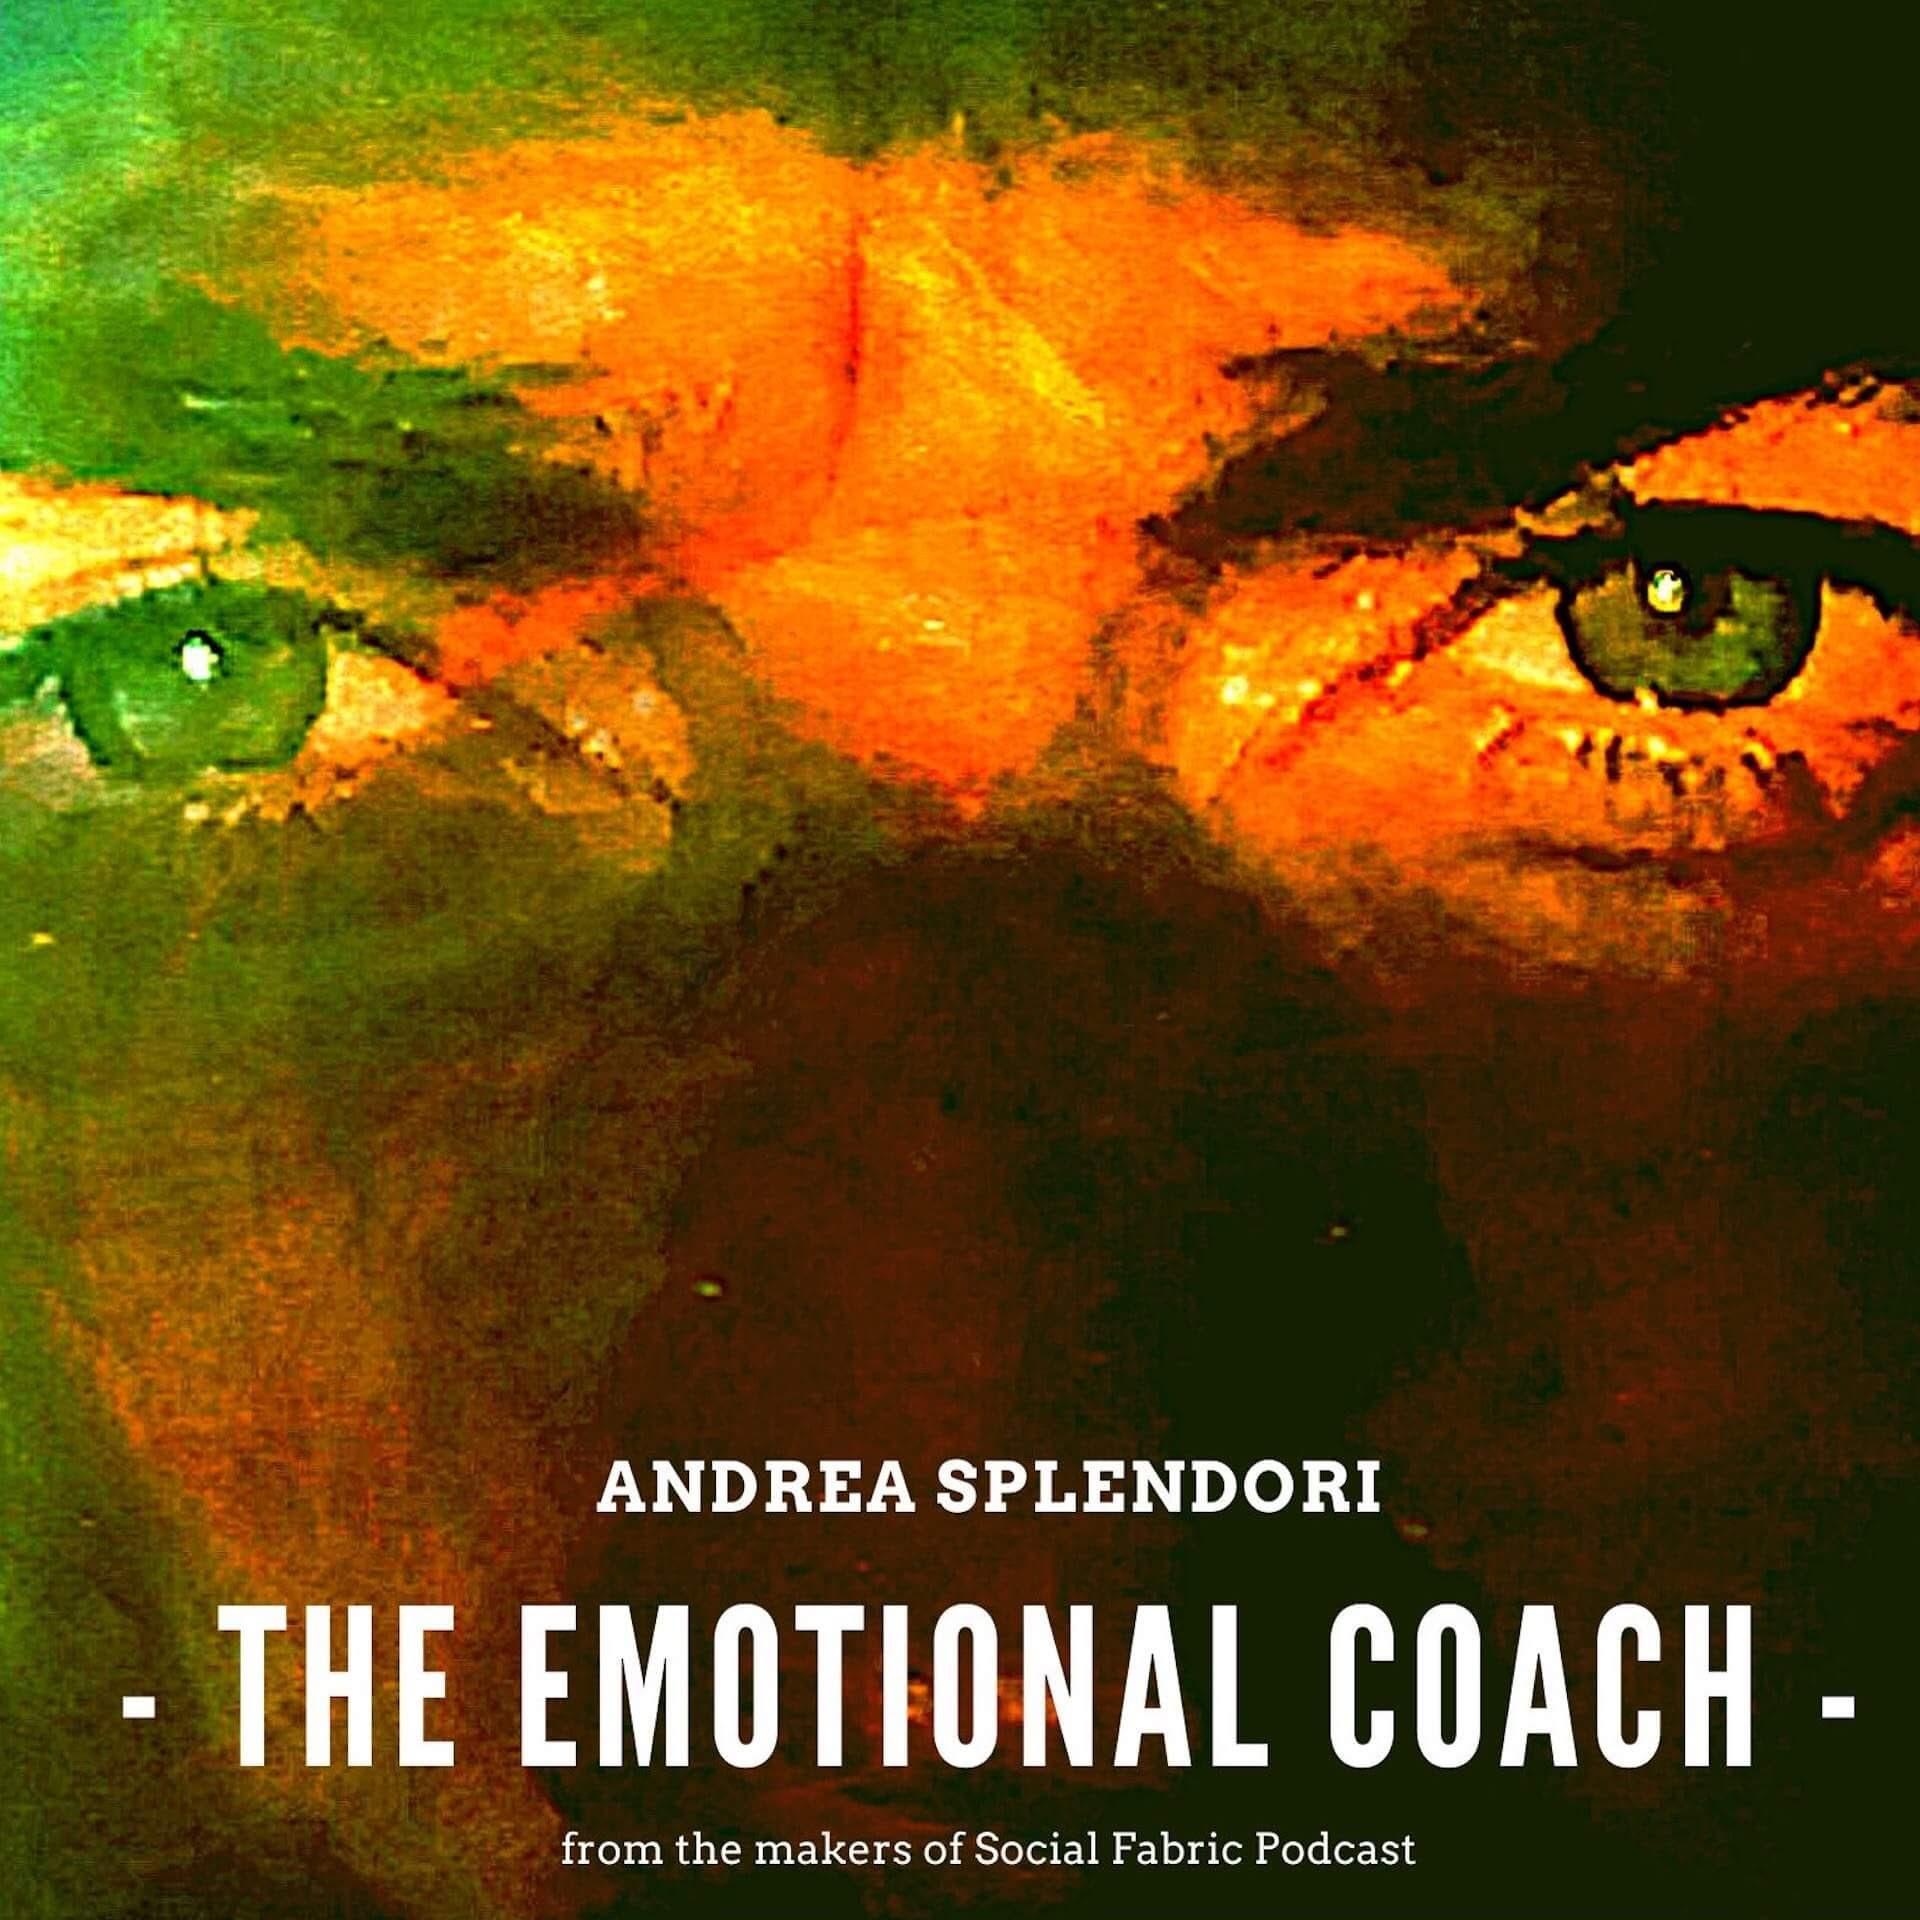 Artwork for podcast The Emotional Coach